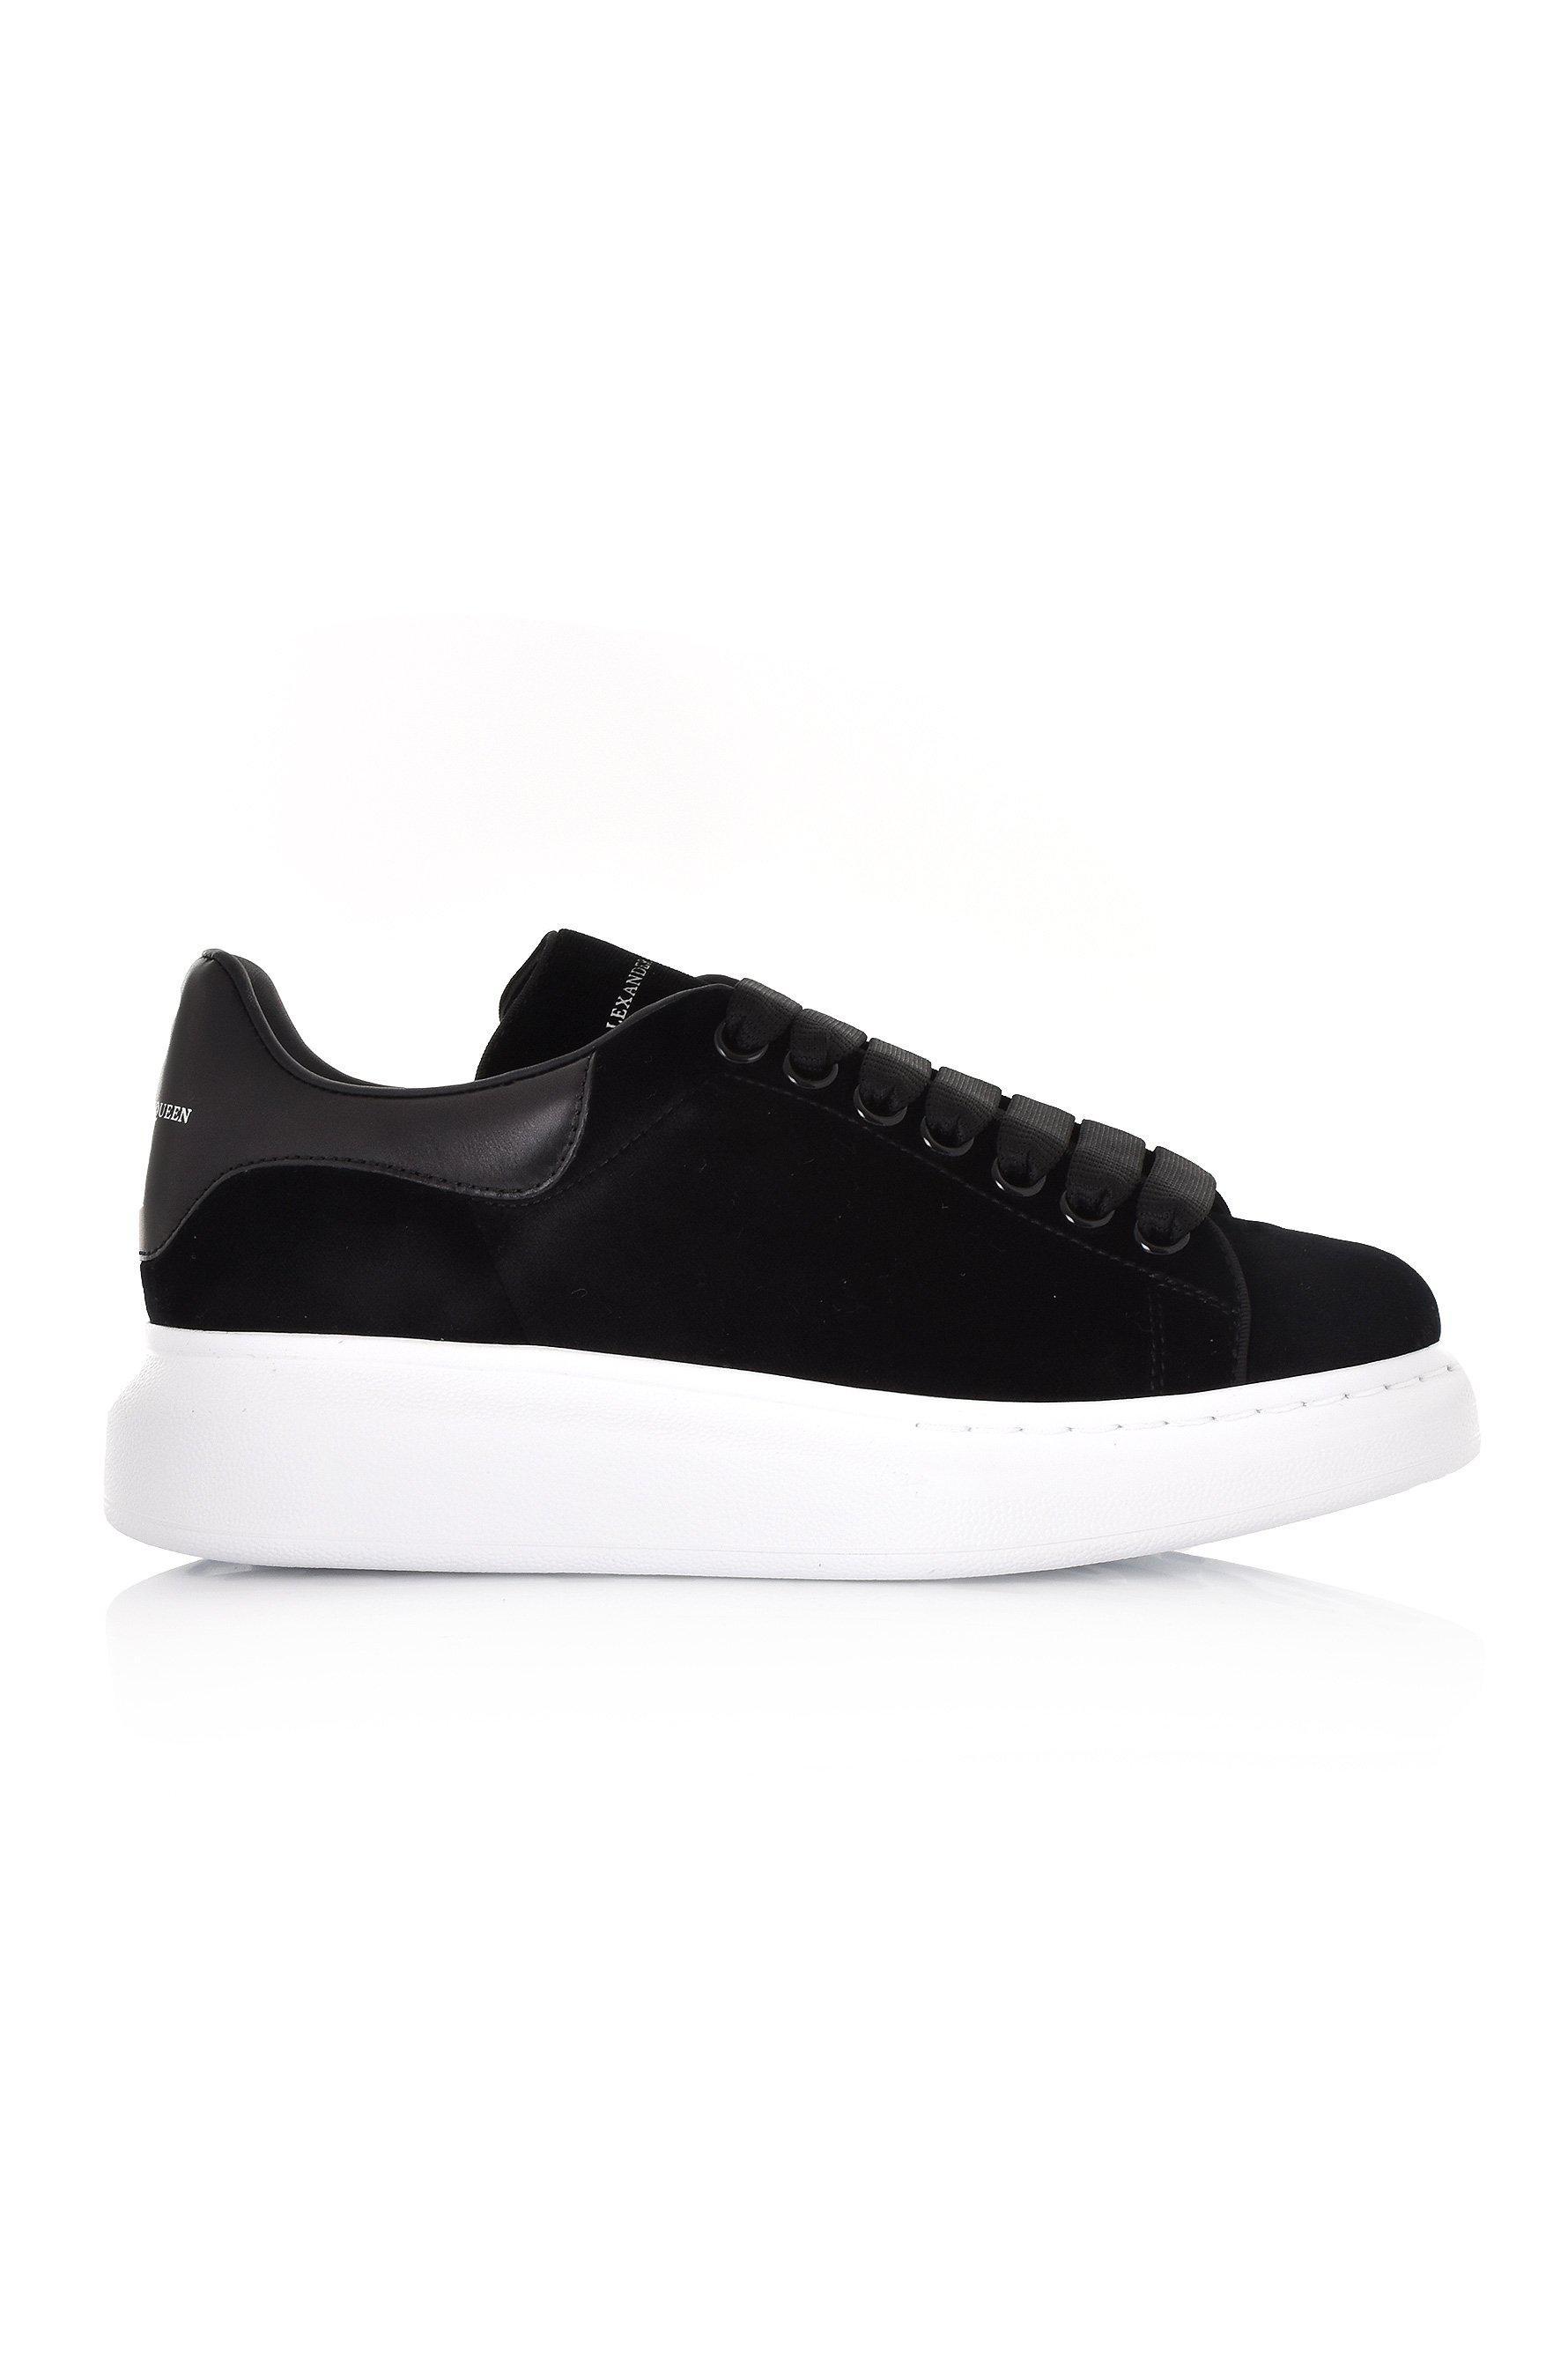 Alexander McQueen. Women s Oversized Black Velvet Black Leather Flash  Trainers 6b2c10c577